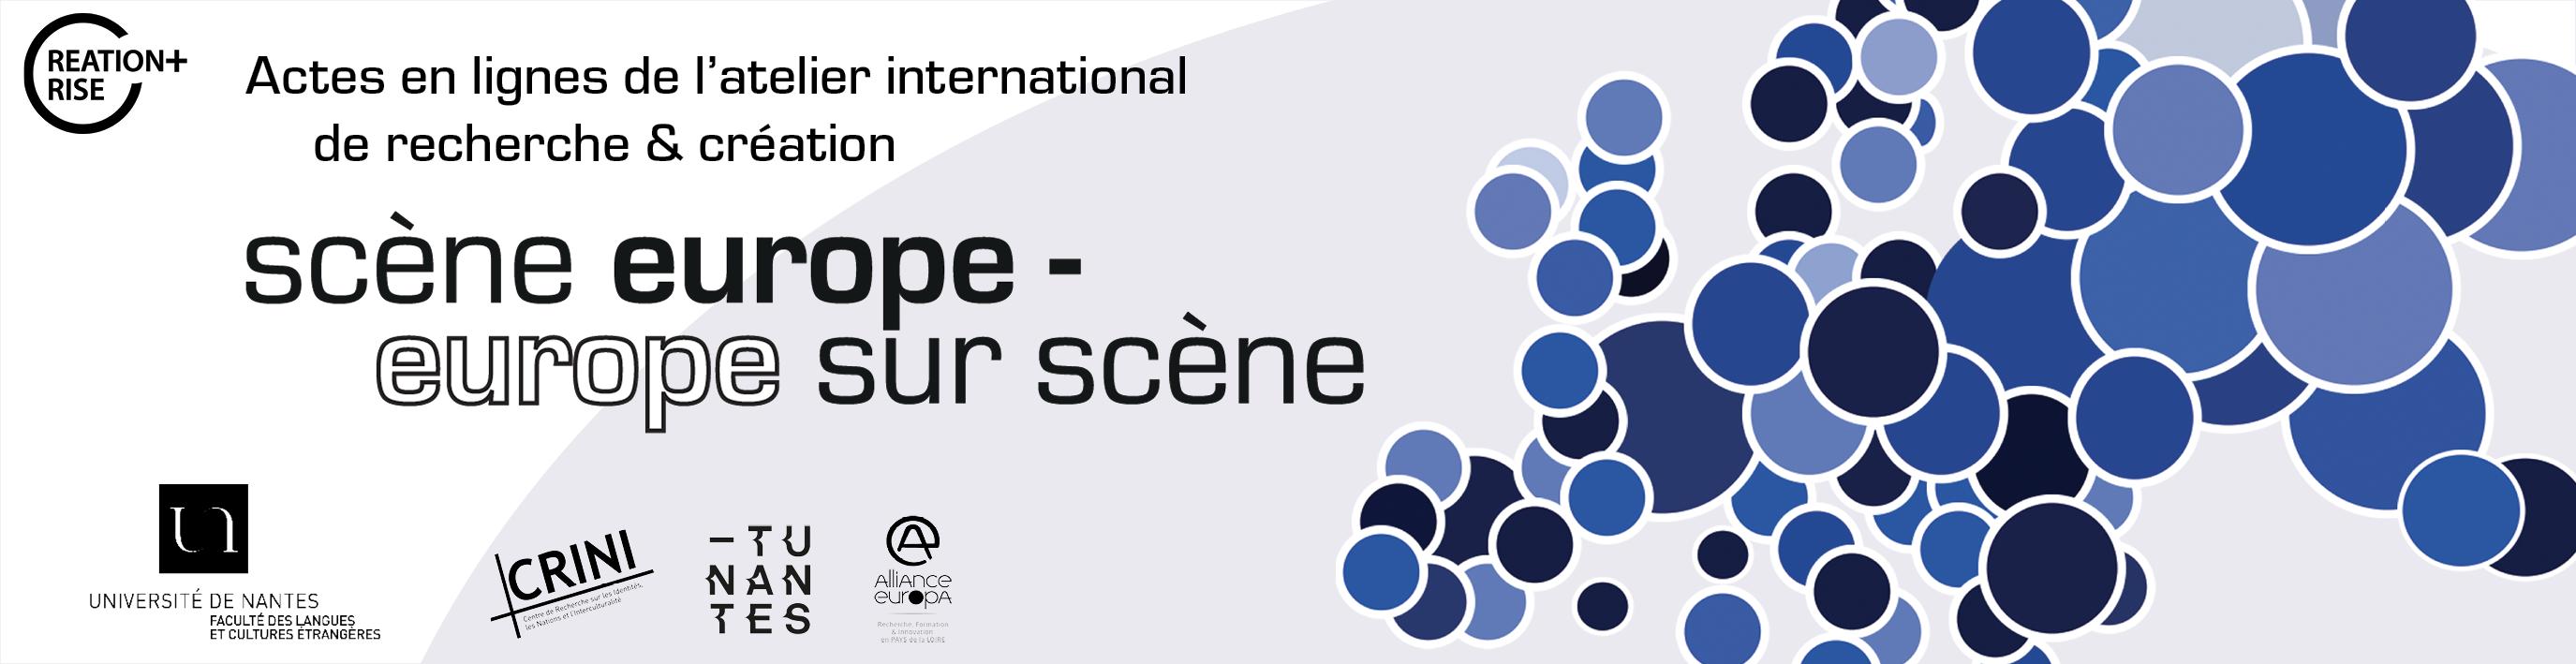 Scène Europe, Europe sur scène